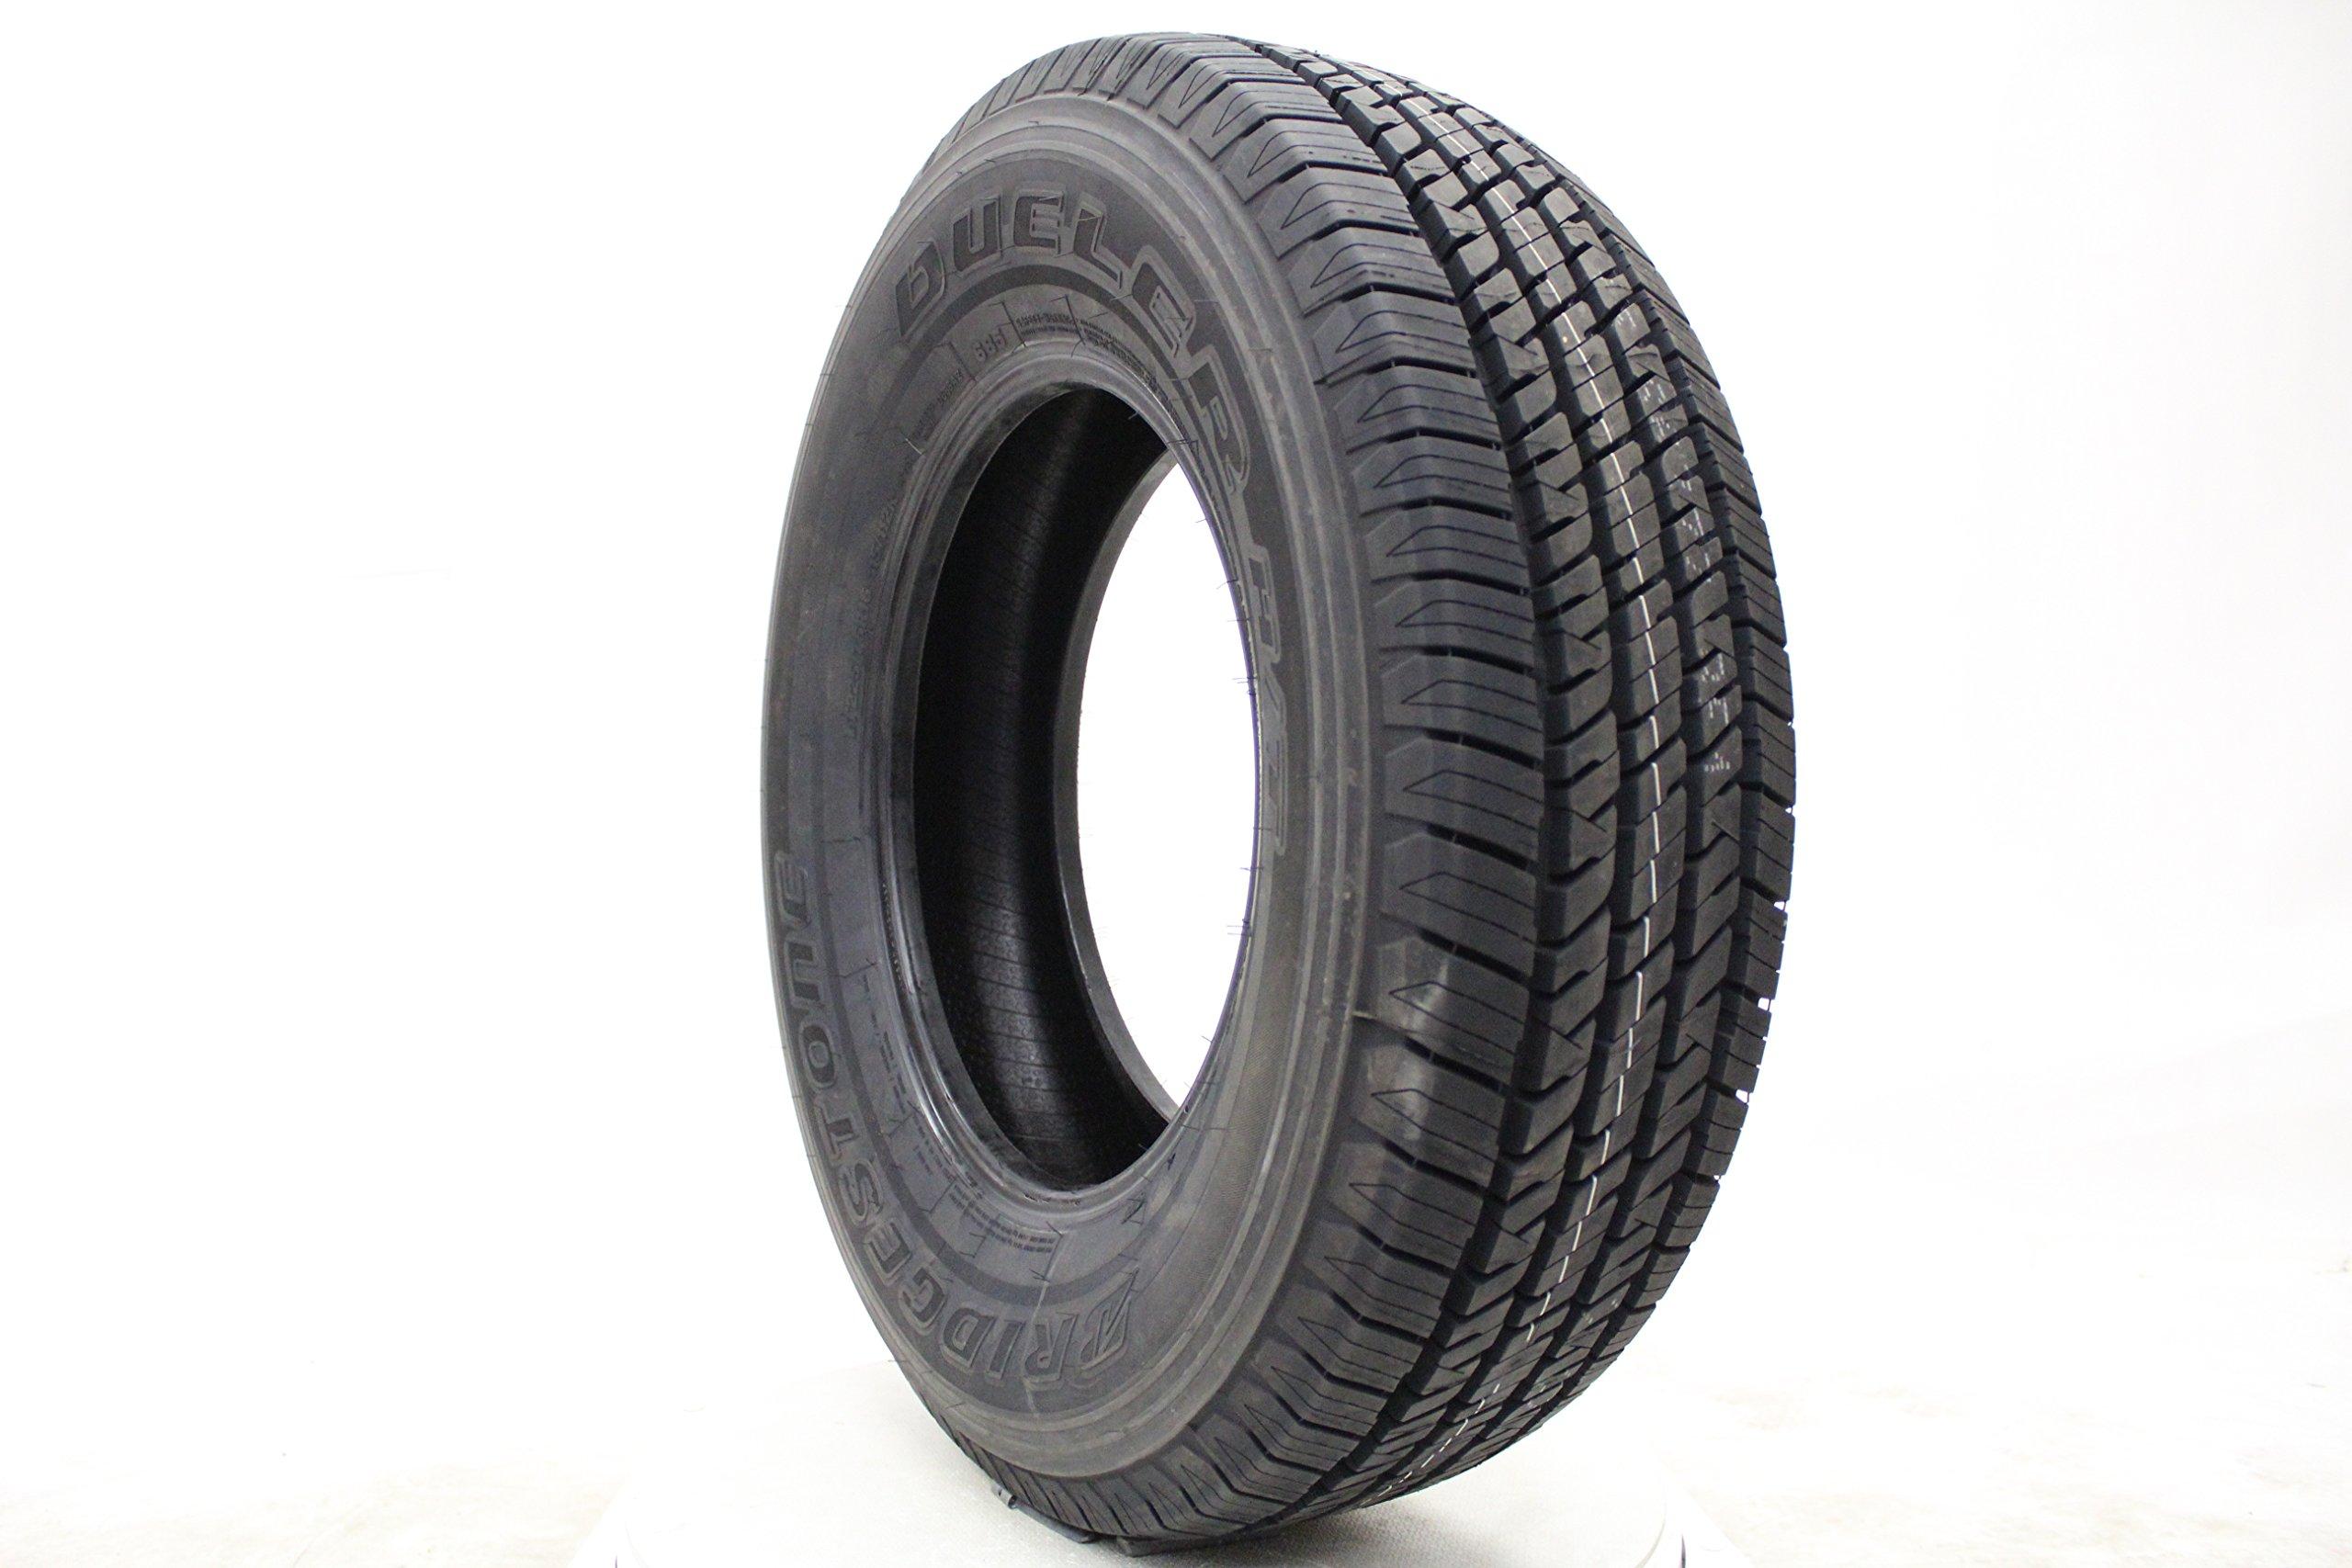 Bridgestone Dueler H/T 685 Commercial Truck Tire - LT225/75R16 115R